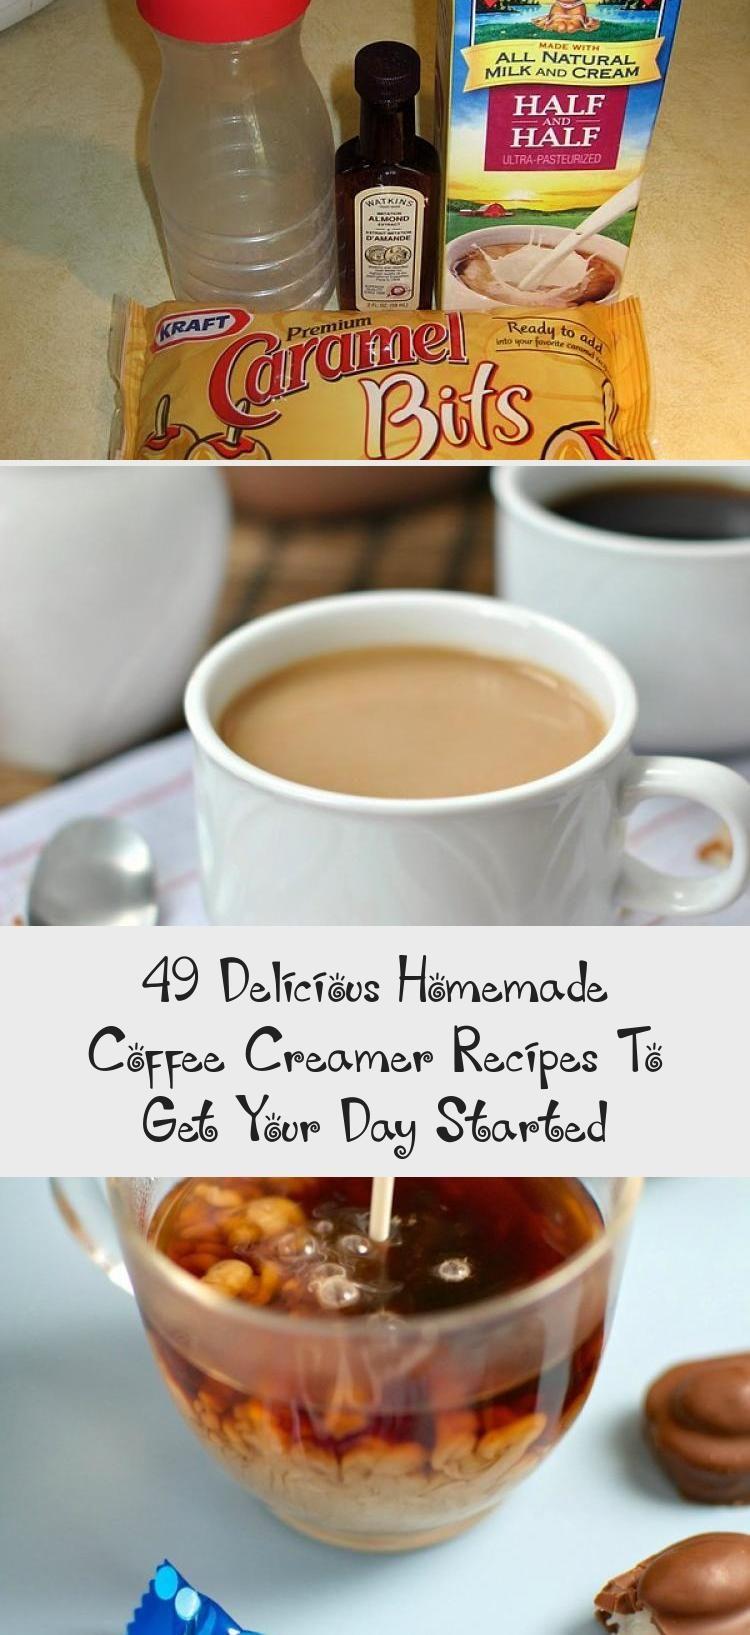 En Blog En Blog In 2020 Homemade Coffee Creamer Coffee Creamer Recipe Homemade Coffee Creamer Recipe